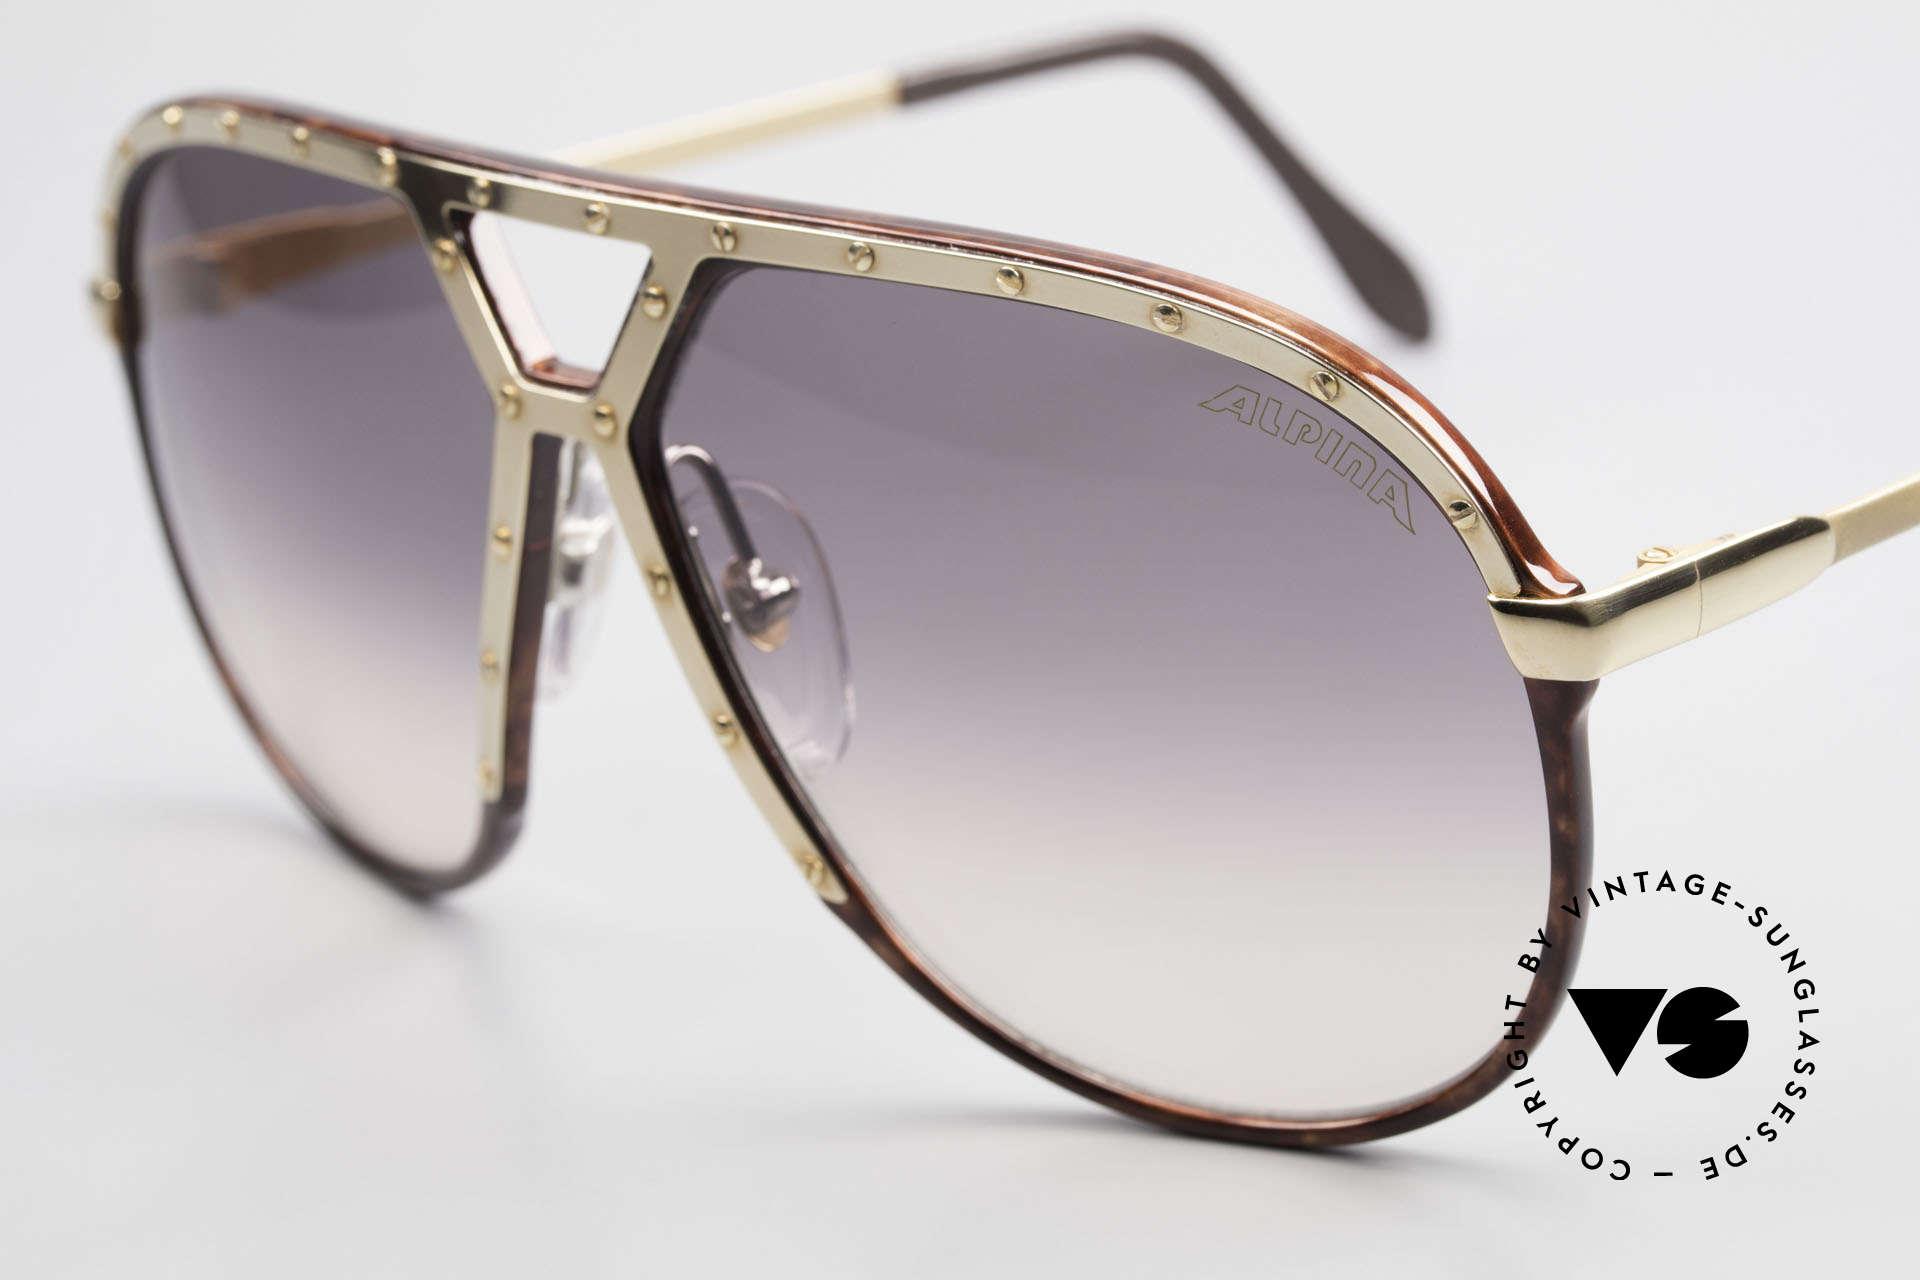 Alpina M1 Ultra Rare Aviator Sunglasses, root wood, golden ornamental cover & 24 screws, Made for Men